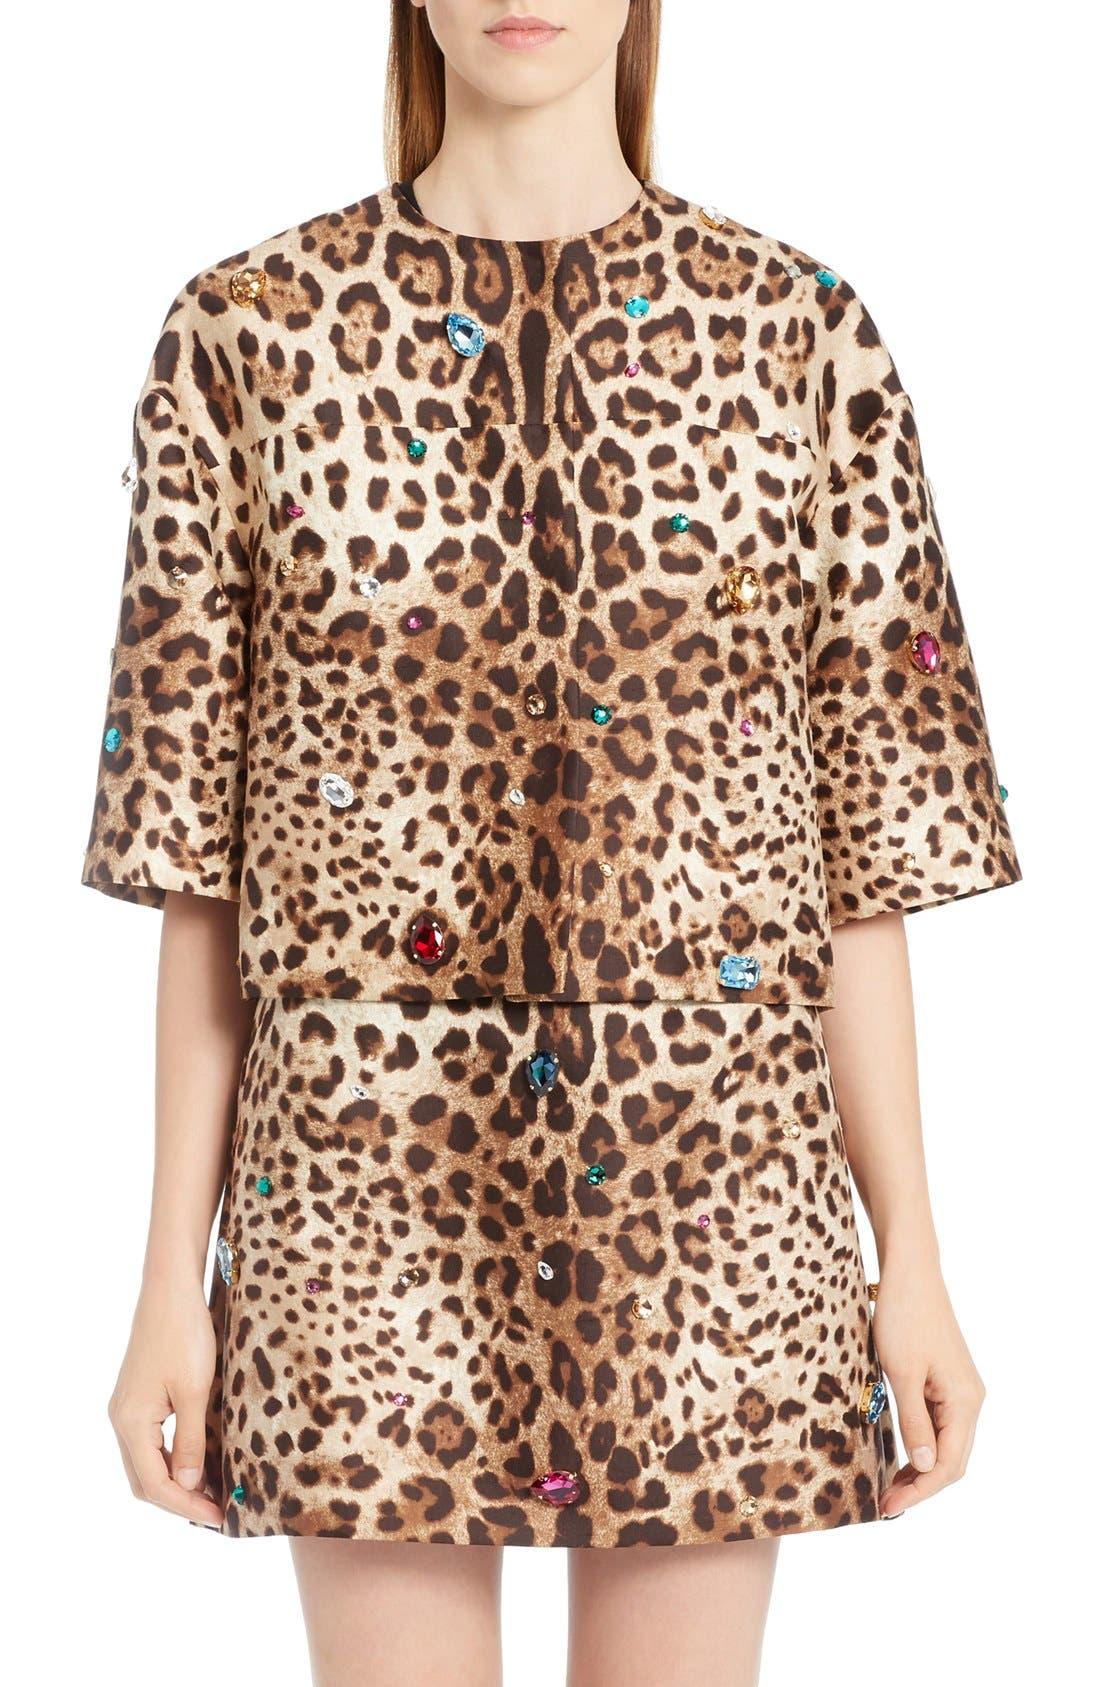 DOLCE&GABBANA Embellished Leopard Print Mikado Jacket